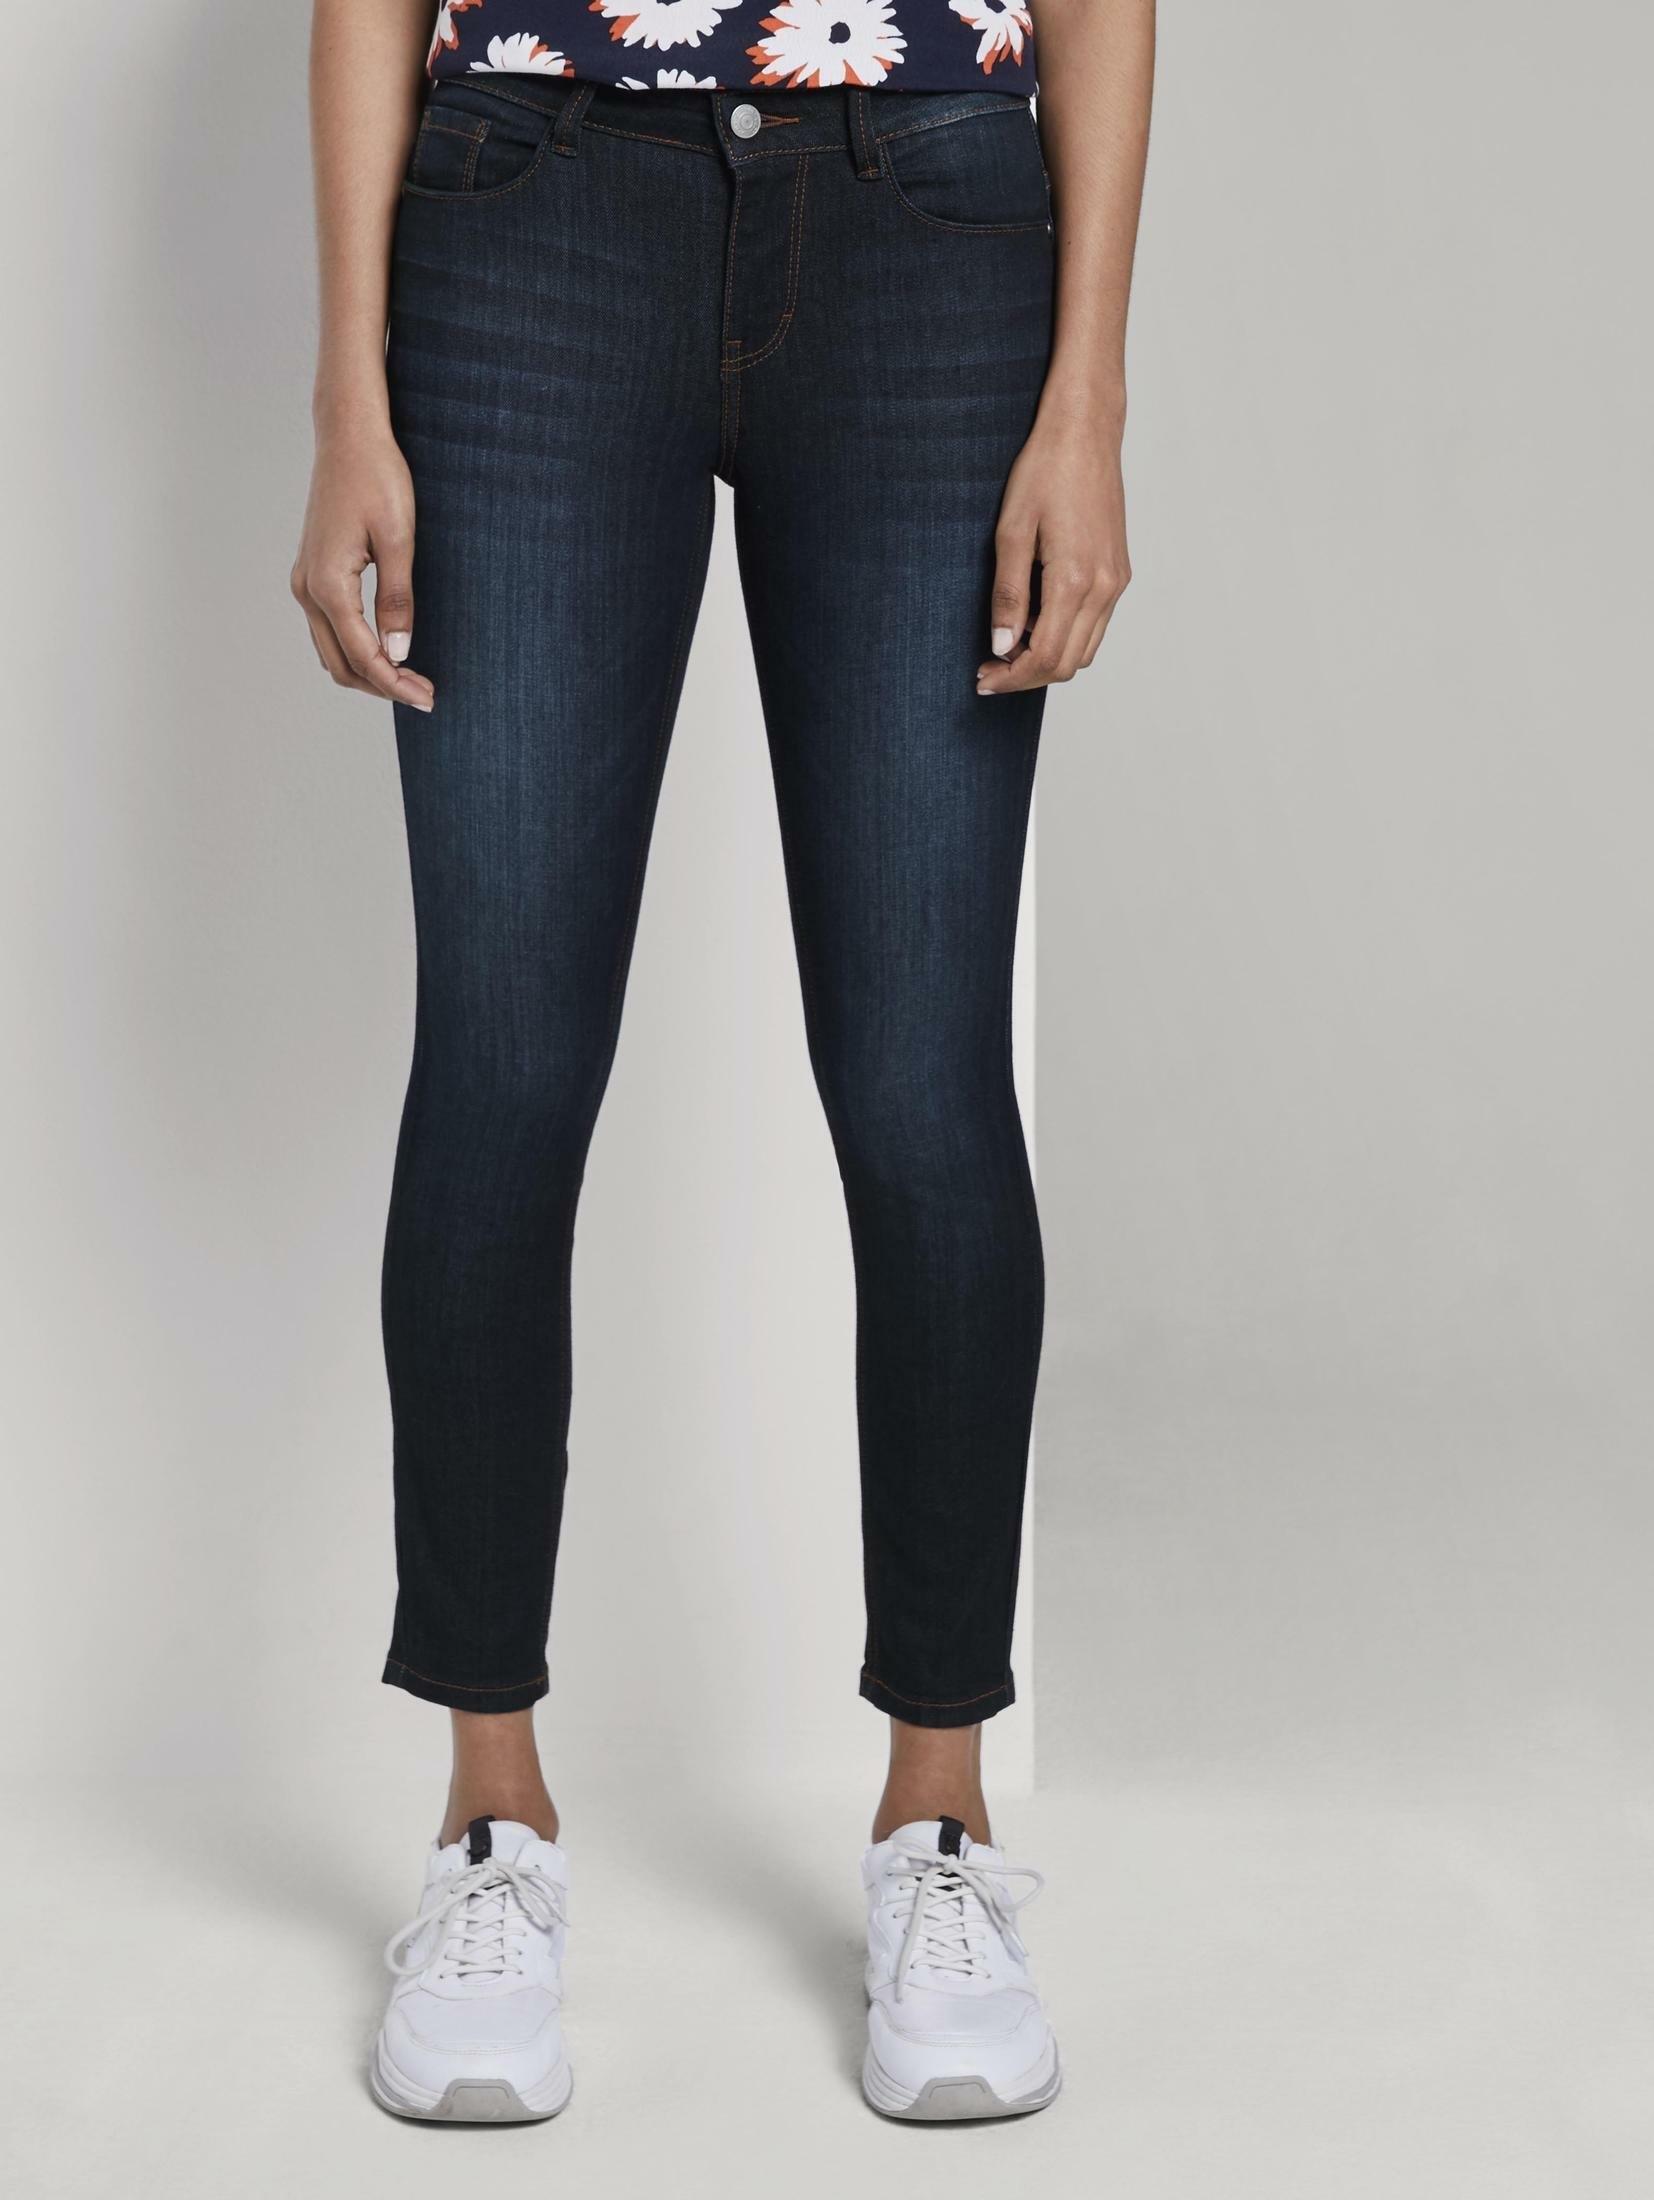 TOM TAILOR mine to five skinny fit jeans »Skinny Jeans« voordelig en veilig online kopen